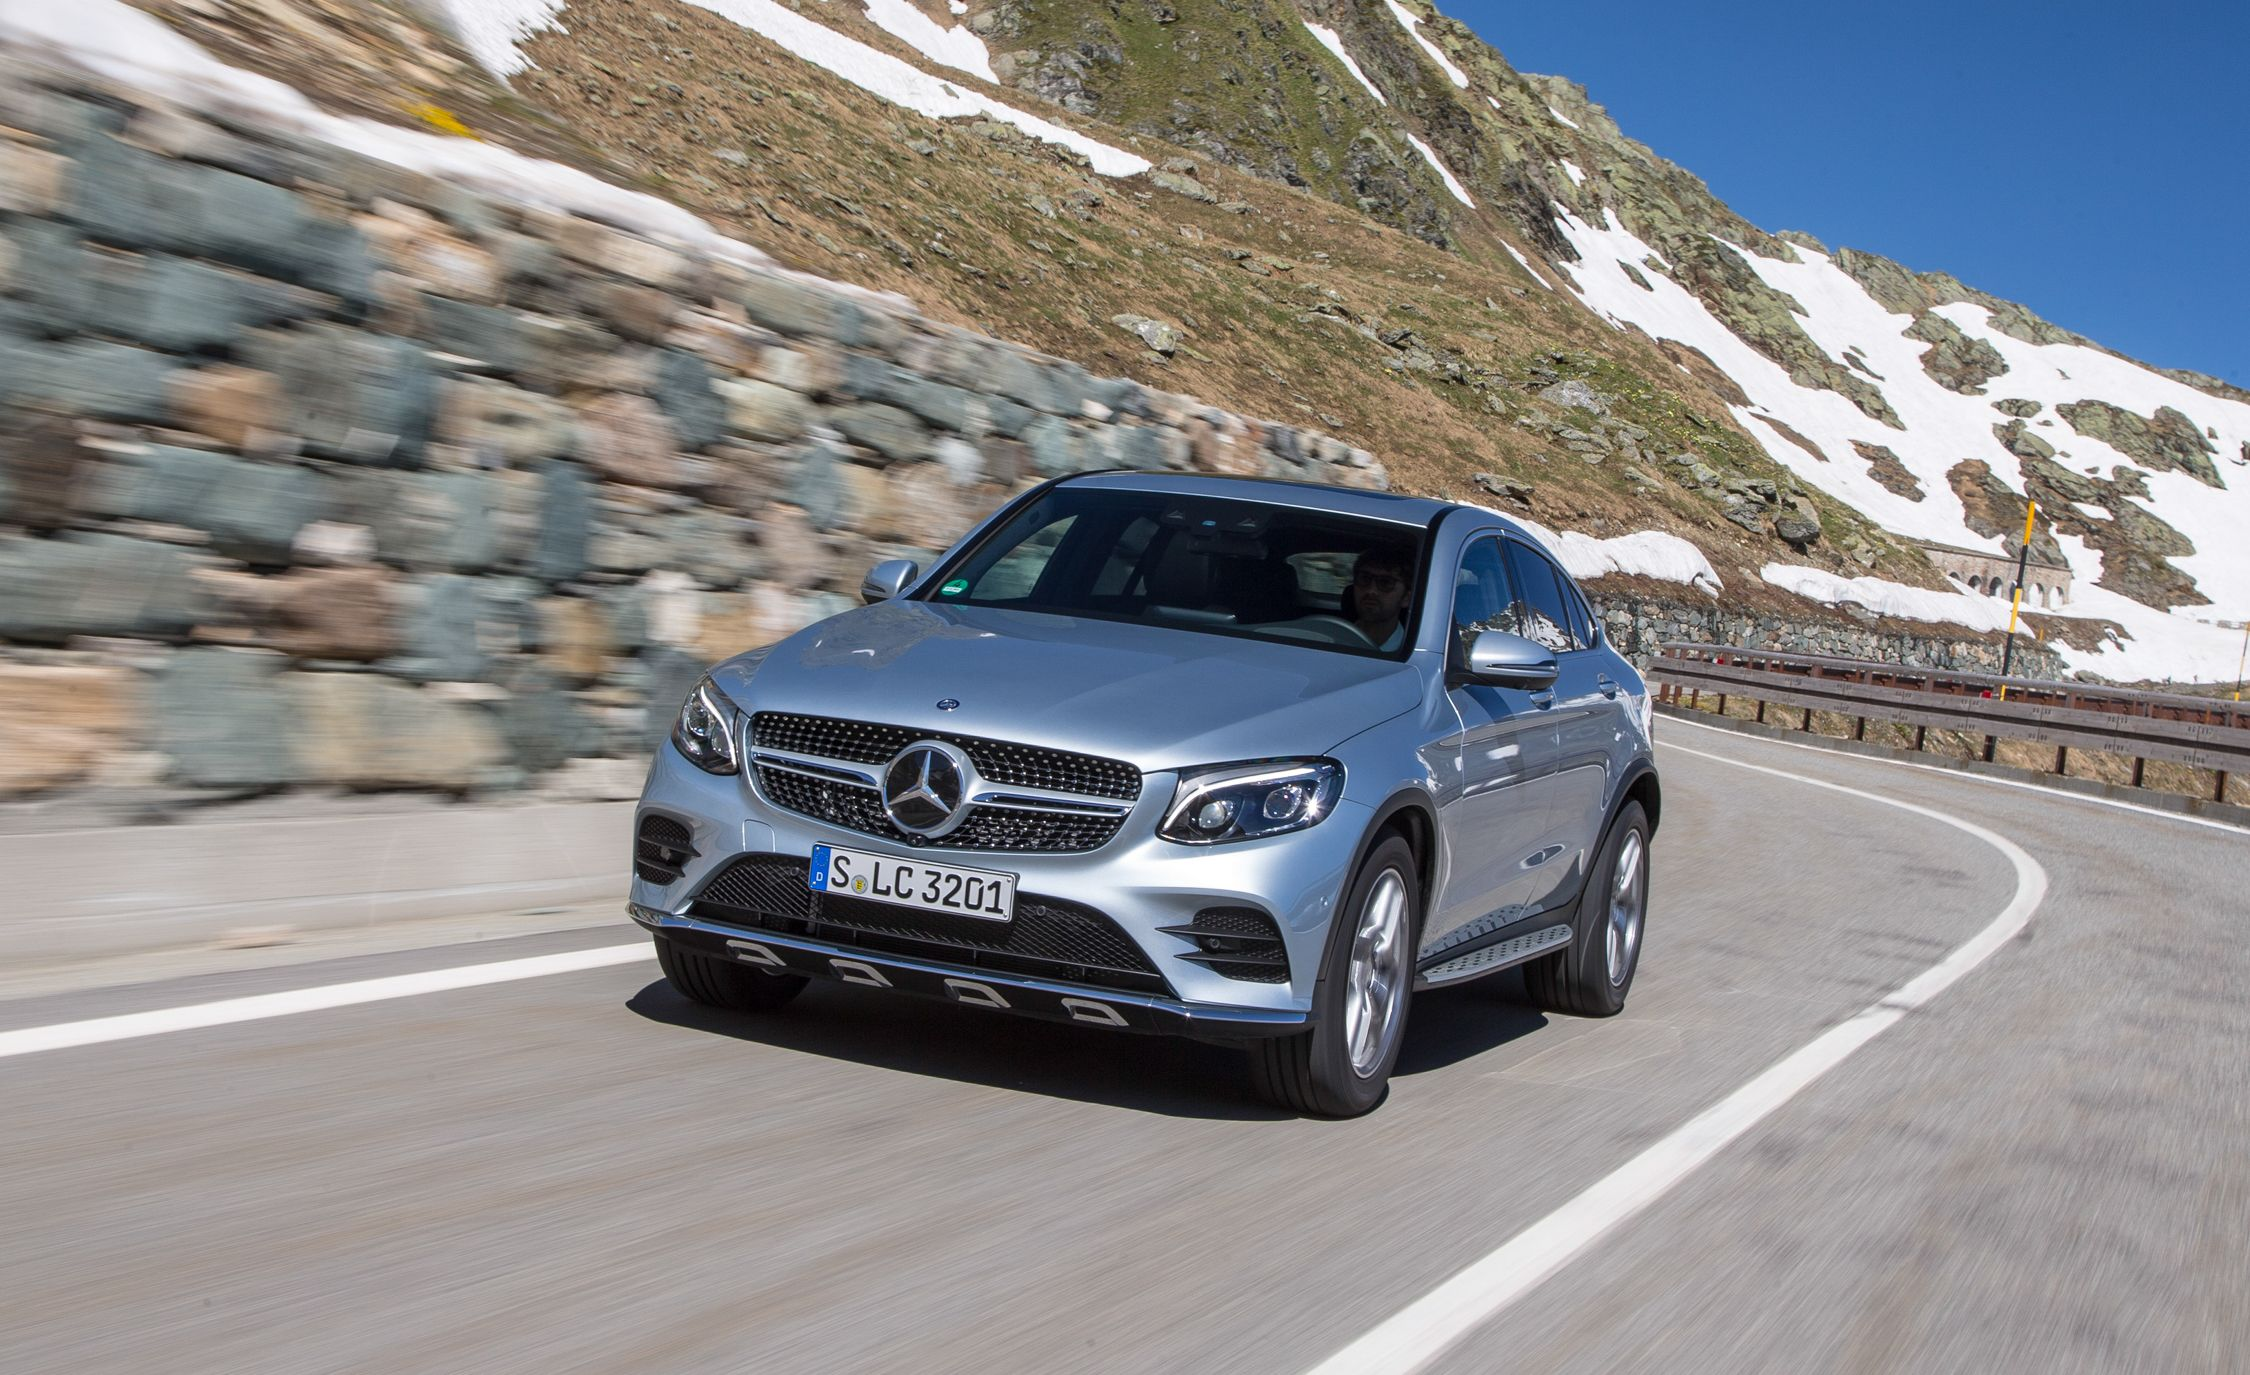 https://hips.hearstapps.com/amv-prod-cad-assets.s3.amazonaws.com/wp-content/uploads/2016/07/2017-Mercedes-Benz-GLC300-4MATIC-coupe-103.jpg